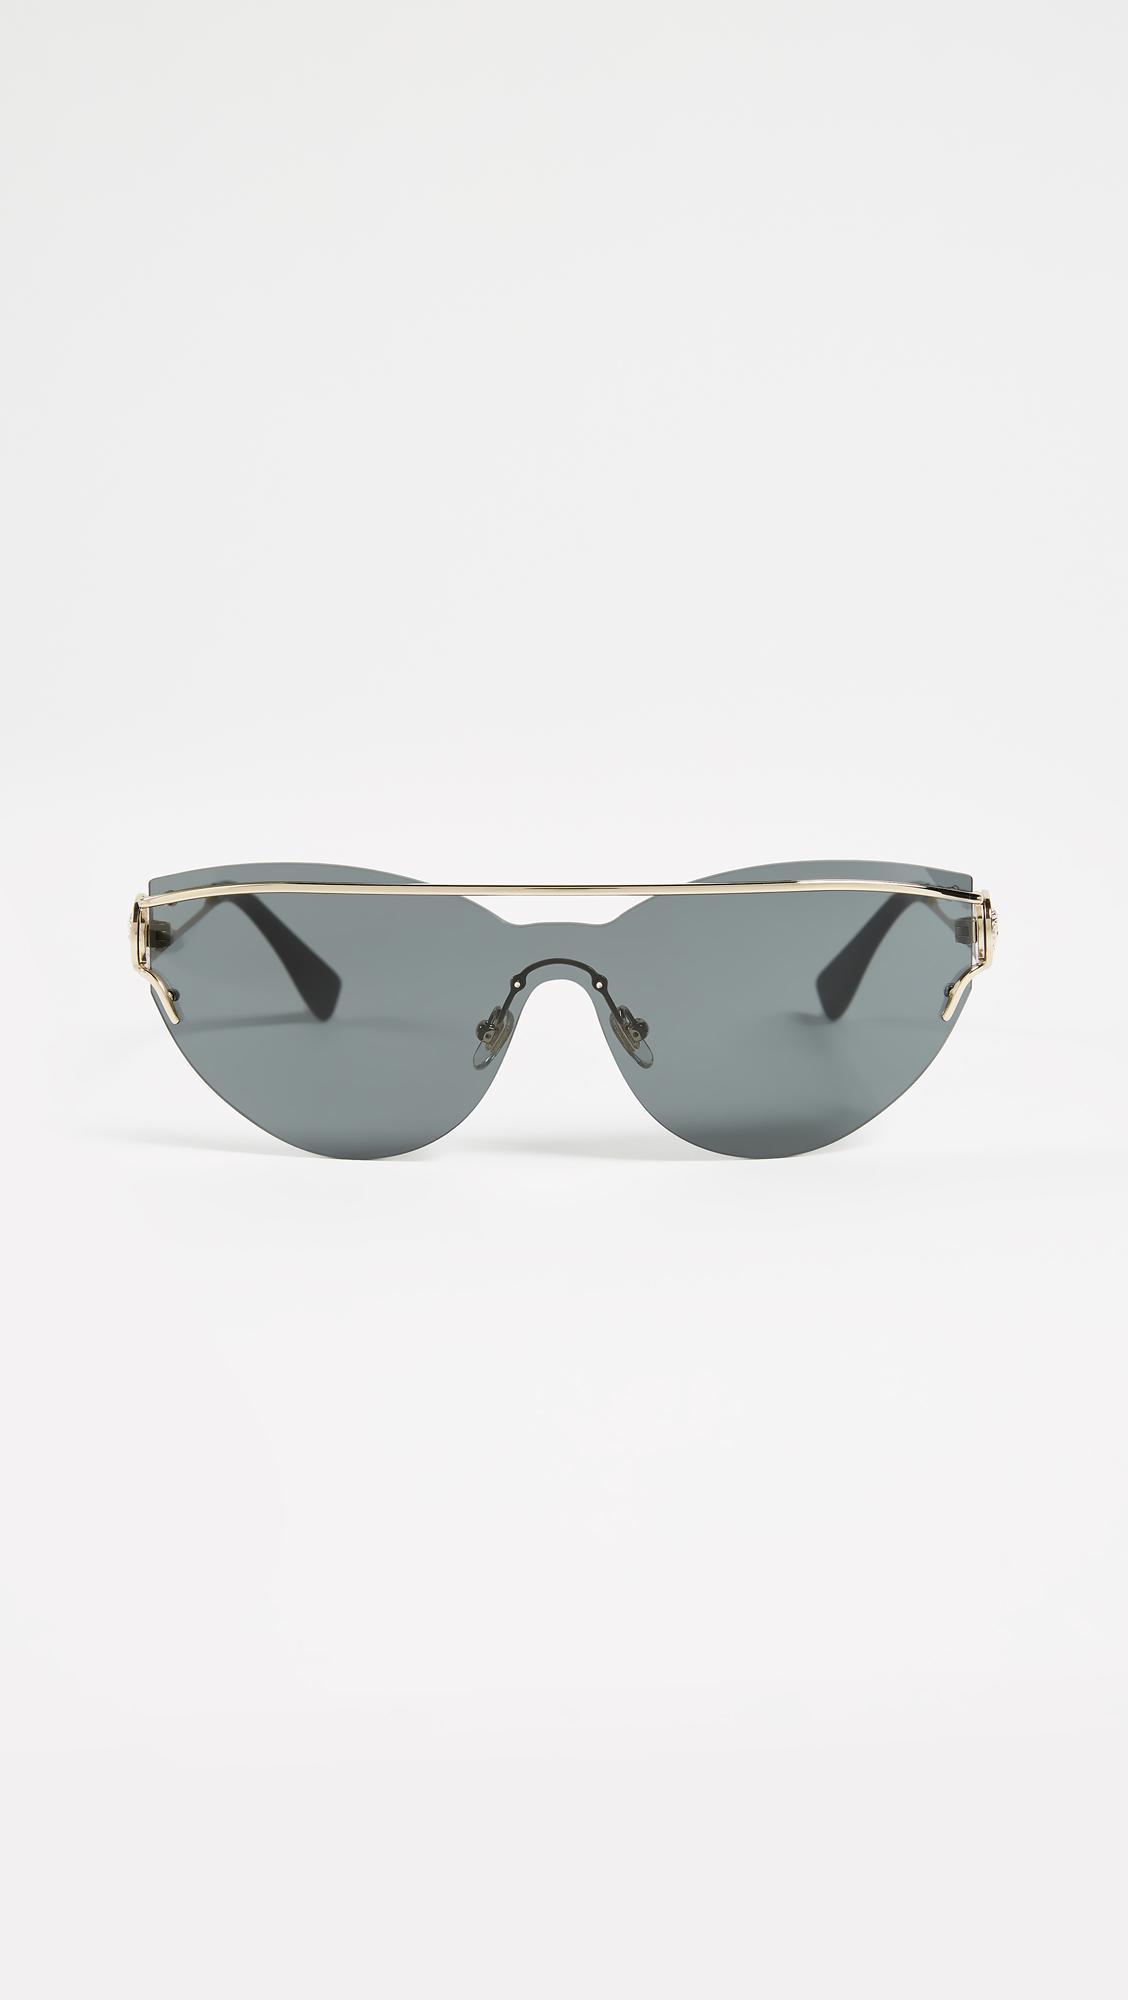 0cfdd0f35ead9 Versace Manifesto Sunglasses in Gray - Lyst